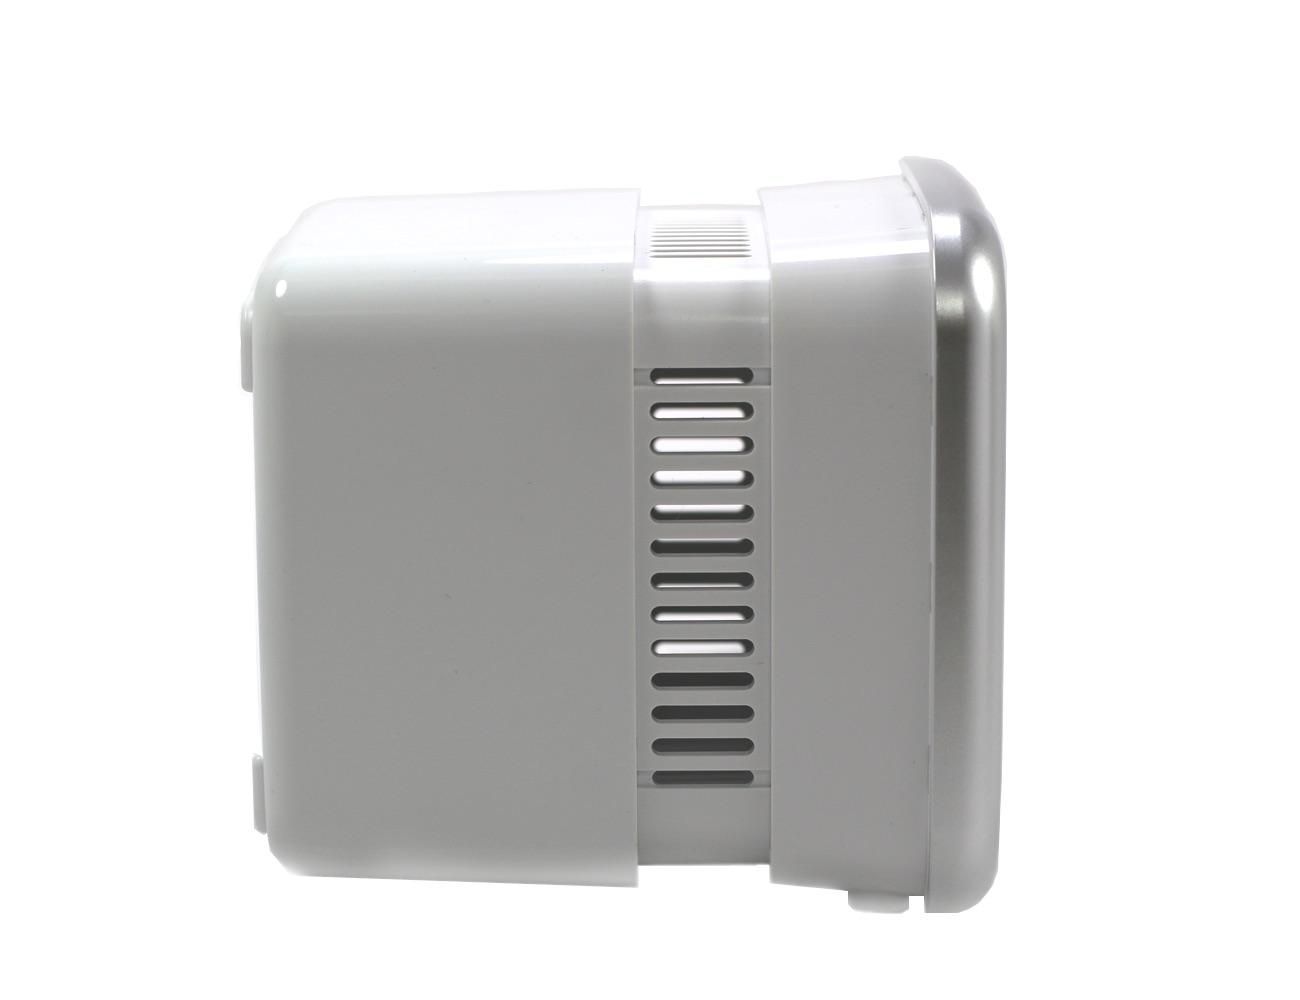 iBen Personal USB Air Purifier/Fan